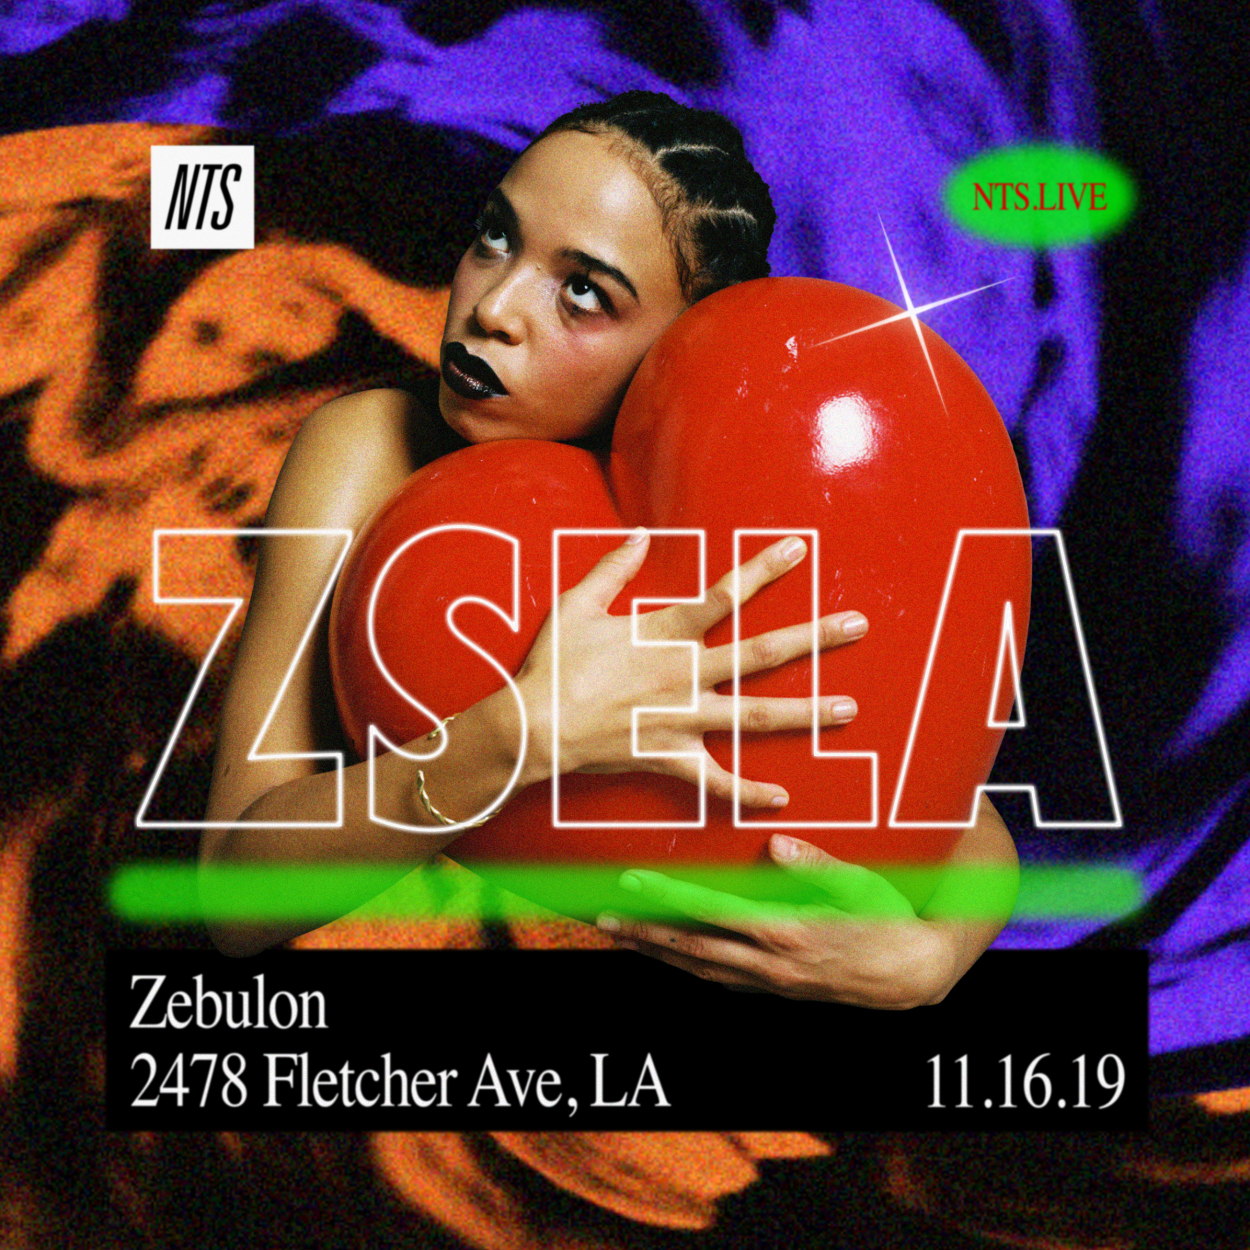 Still (Square) - ZSELA @ Zebulon - NTS - 16.11.19.jpg